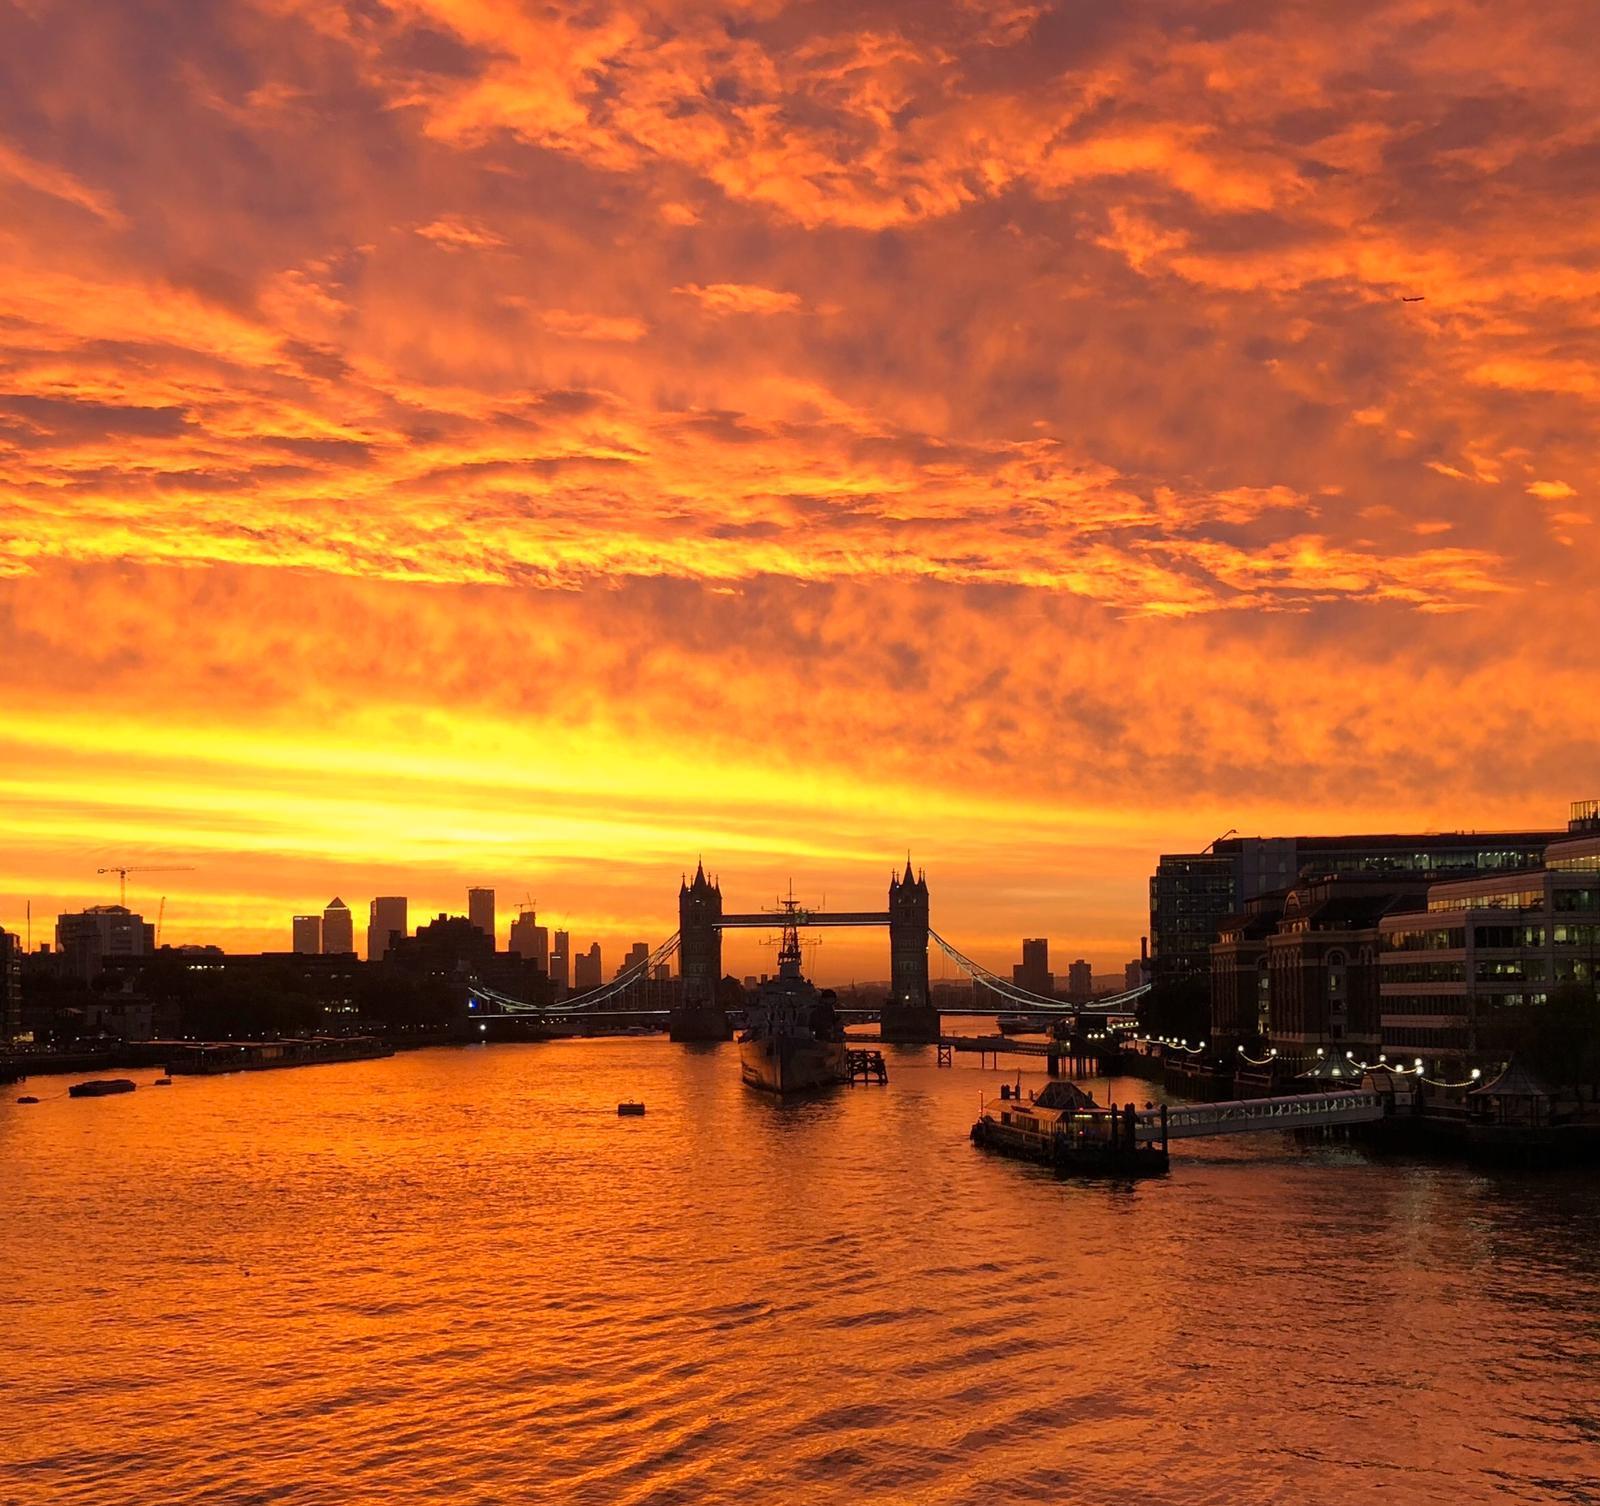 Taken from London Bridge. 7am Monday.